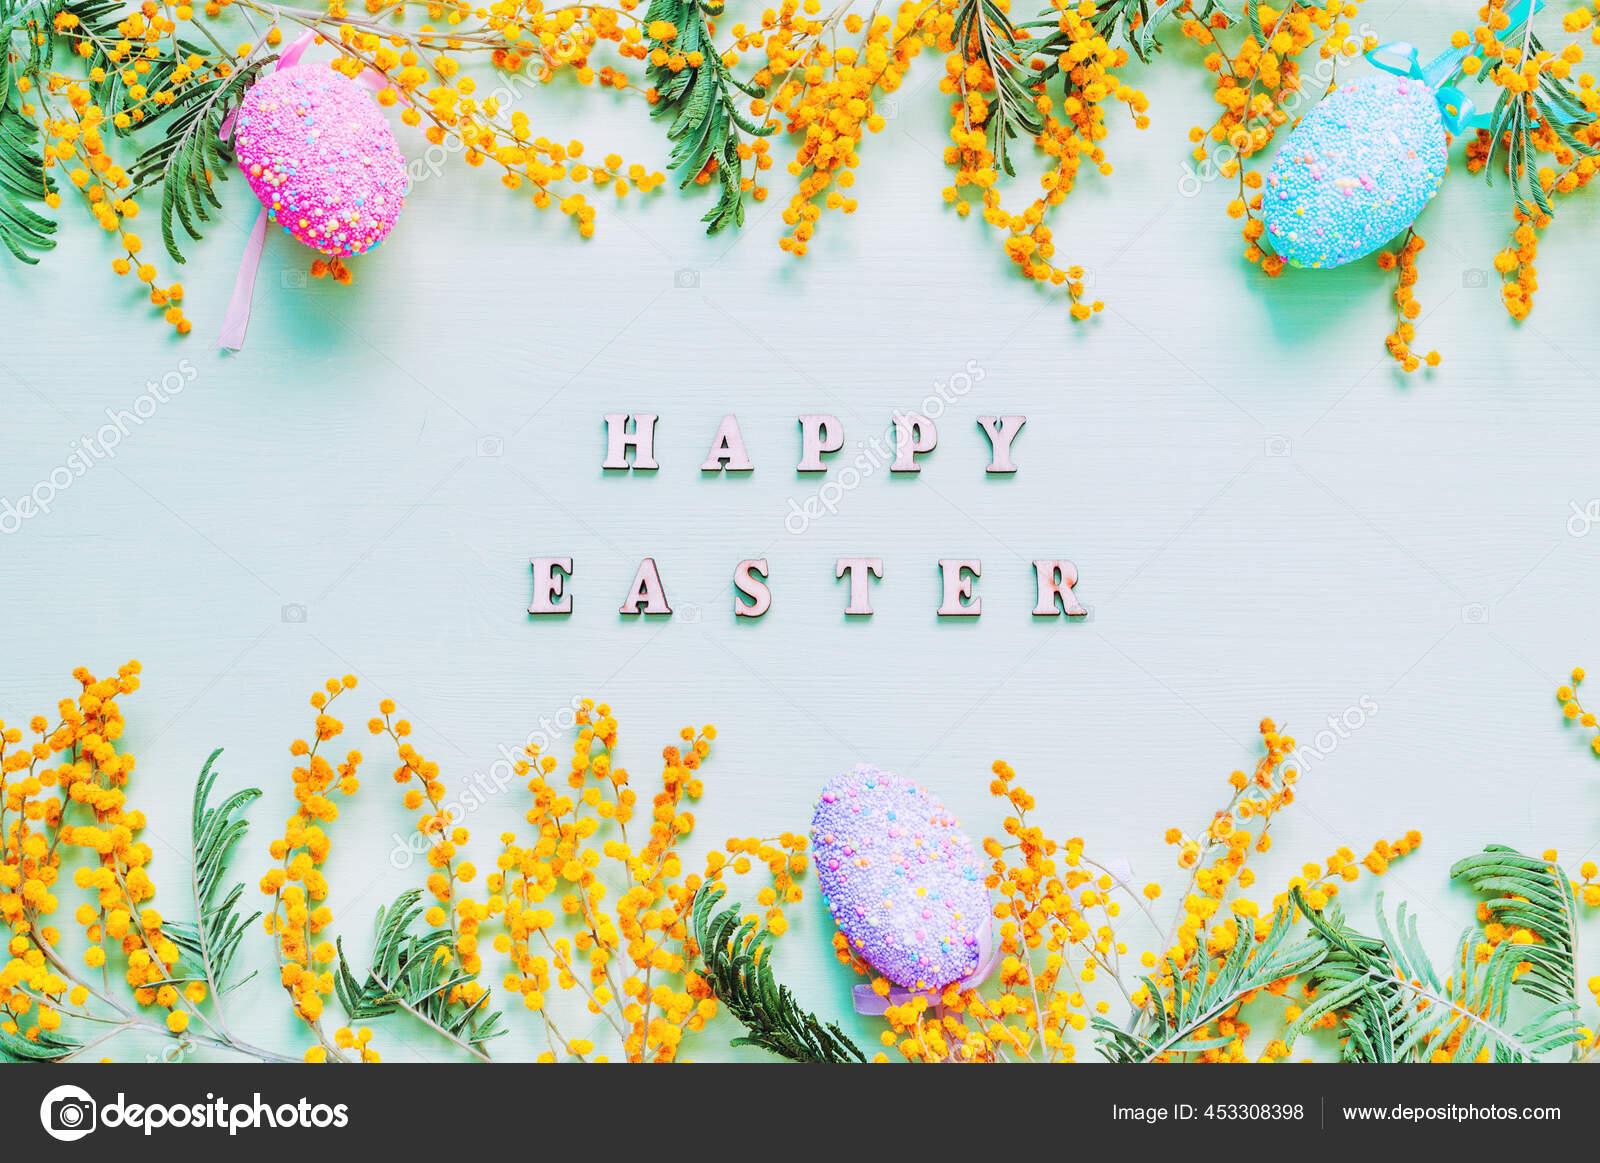 Easter 2021 Stok Foto Easter 2021 Gambar Bebas Royalti Depositphotos